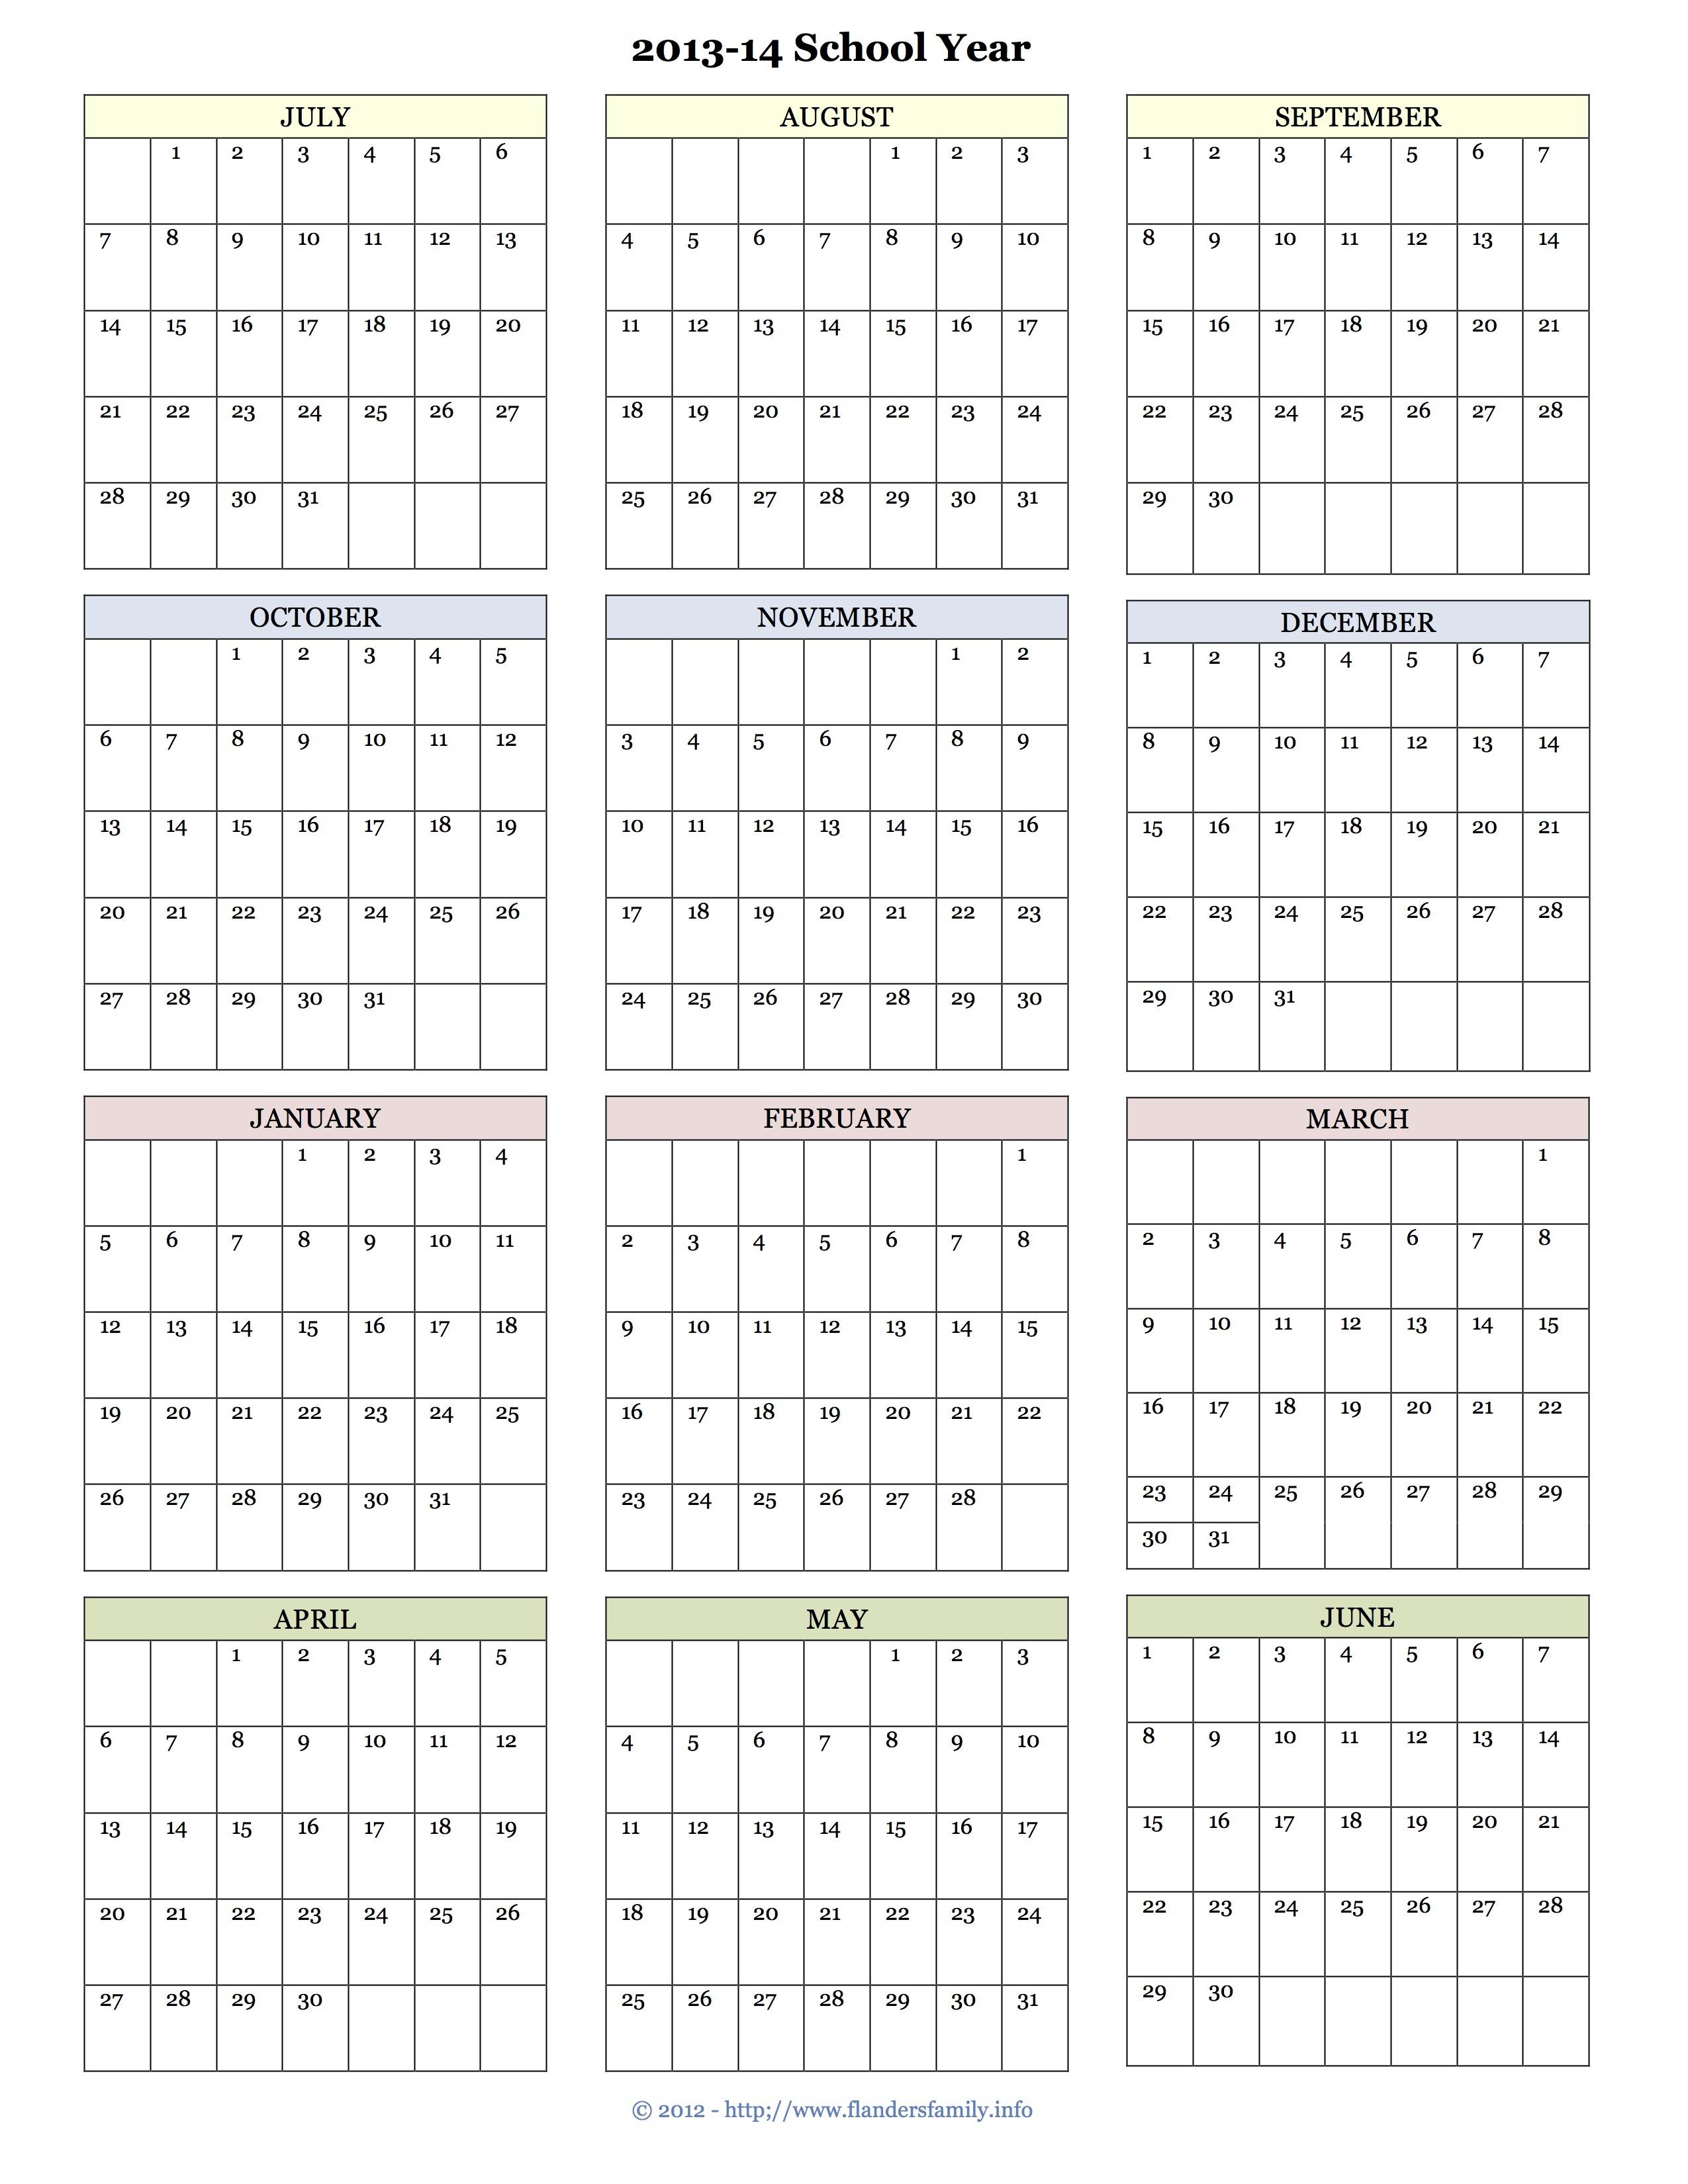 2013 yearly calendars